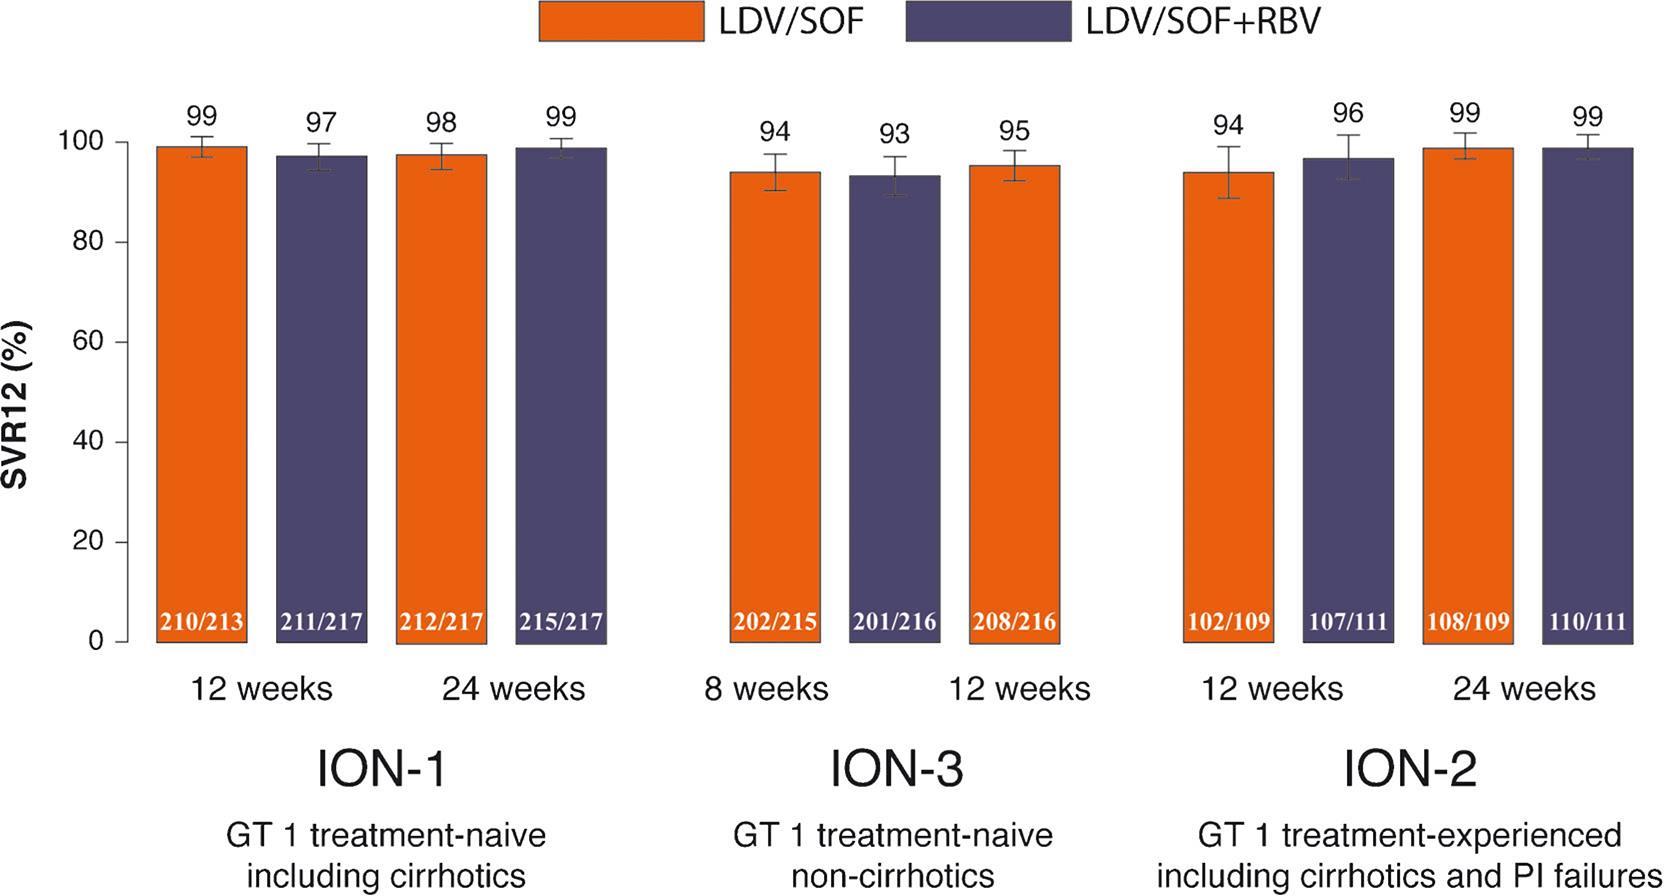 ION phase 3 program (ION-1, ION-2, ION-3) efficacy summary.